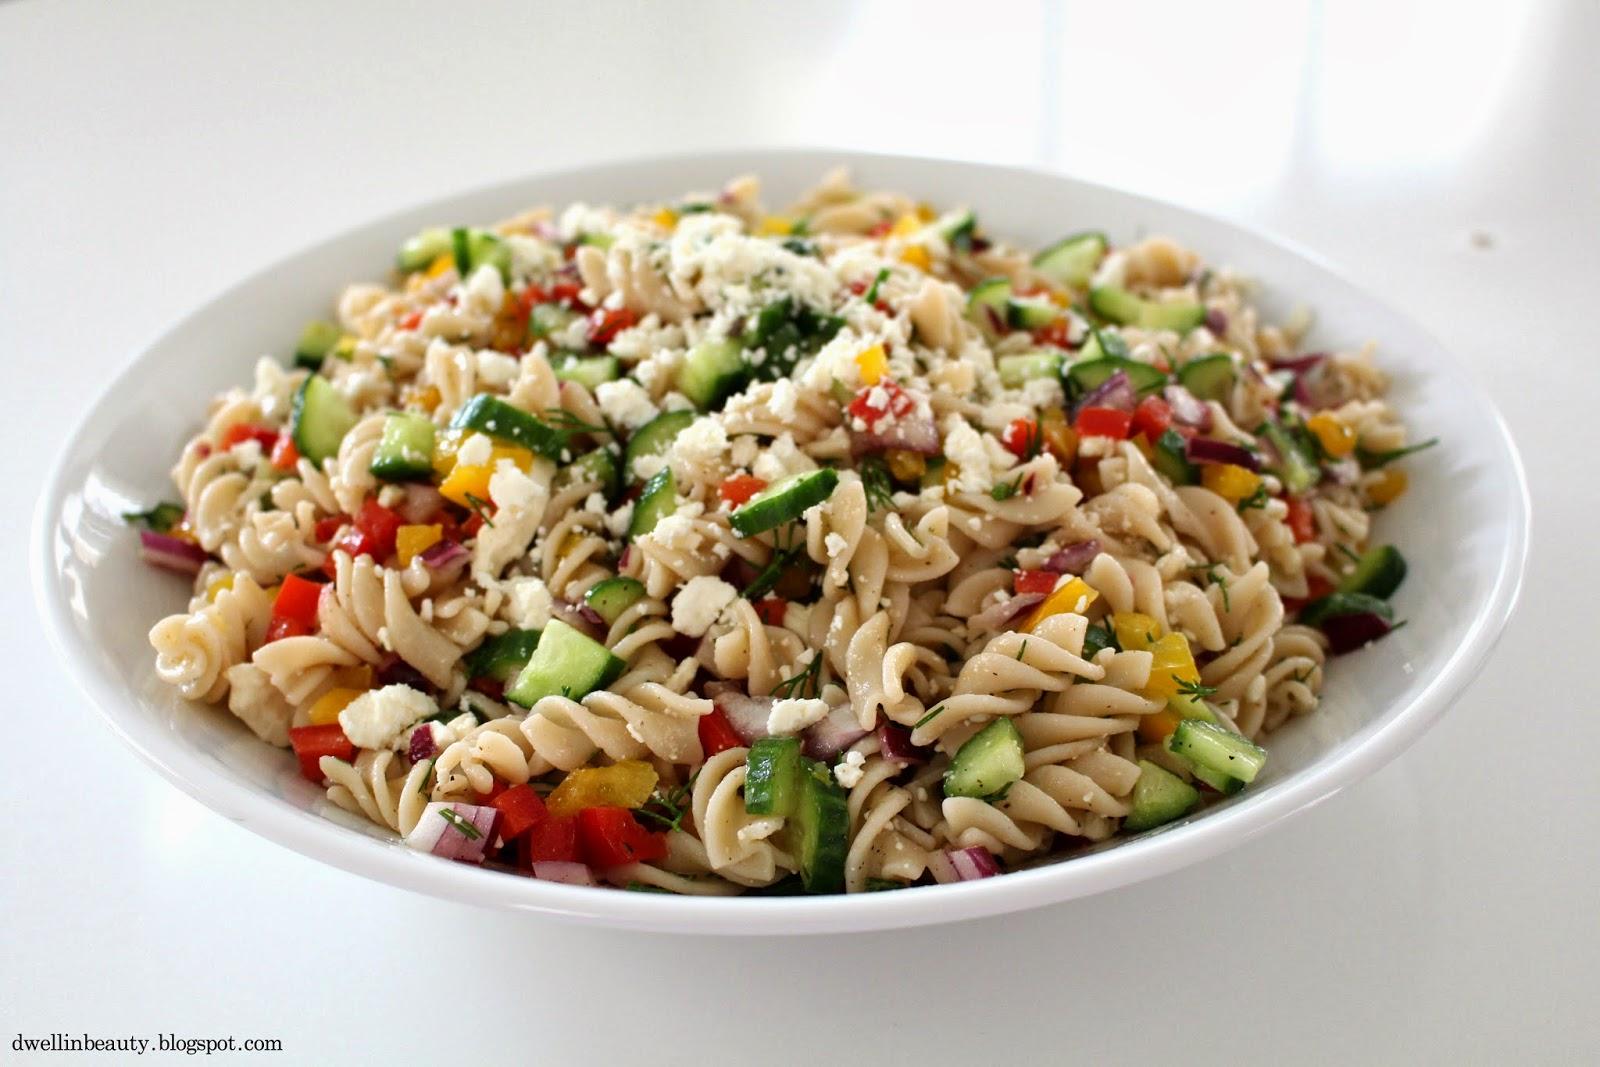 Dwell in Beauty: Dill & Veggie Garden Pasta Salad